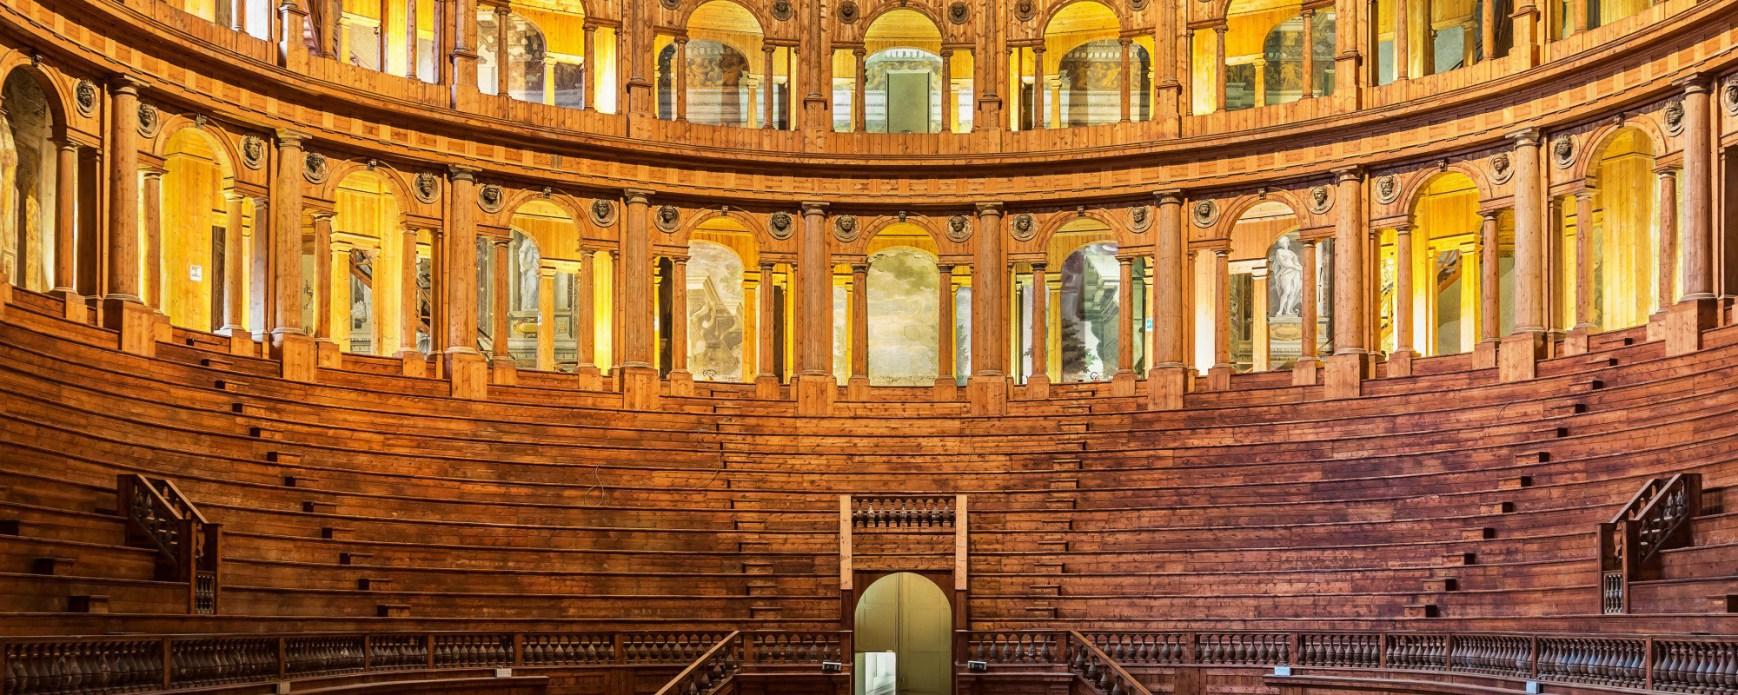 Parma - Teatro Farnese, un bellissimo teatro ligneo